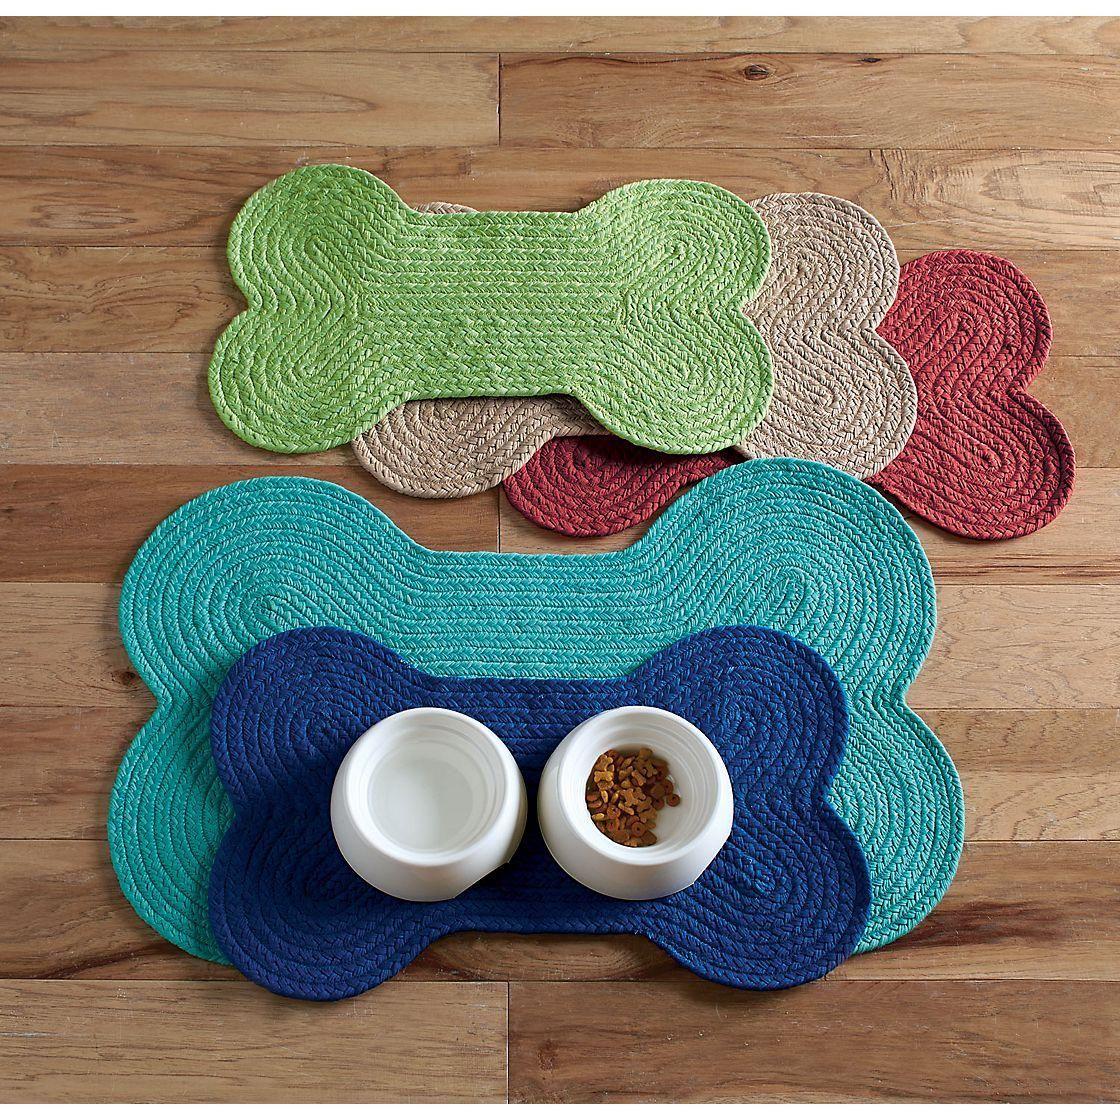 Feeding Rug Placemats Patterns Crochet Placemat Patterns Crochet Placemats